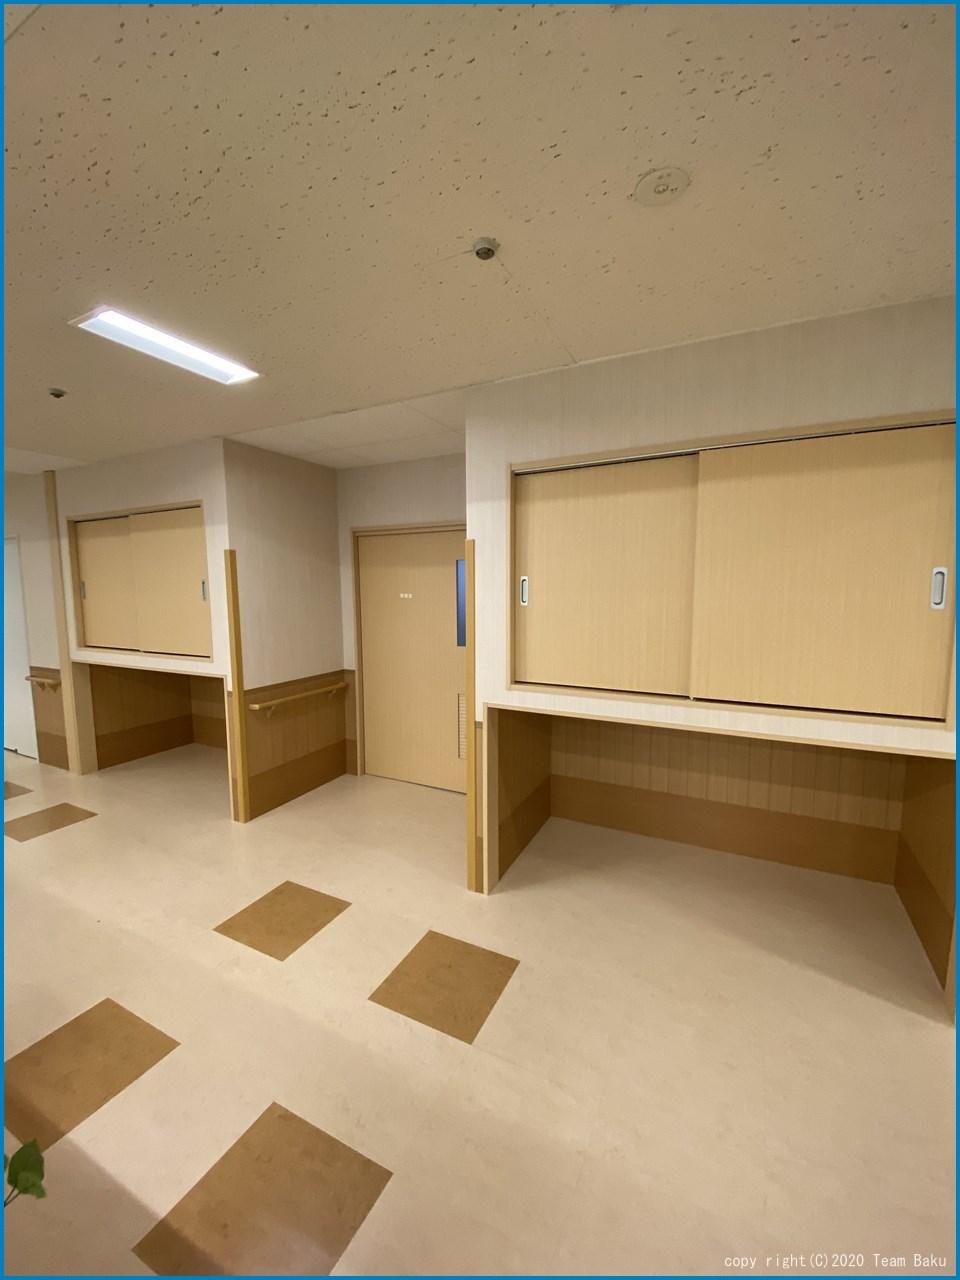 N病院グループ Nナーシング南館 改修・増築工事 6_c0376508_17105158.jpg